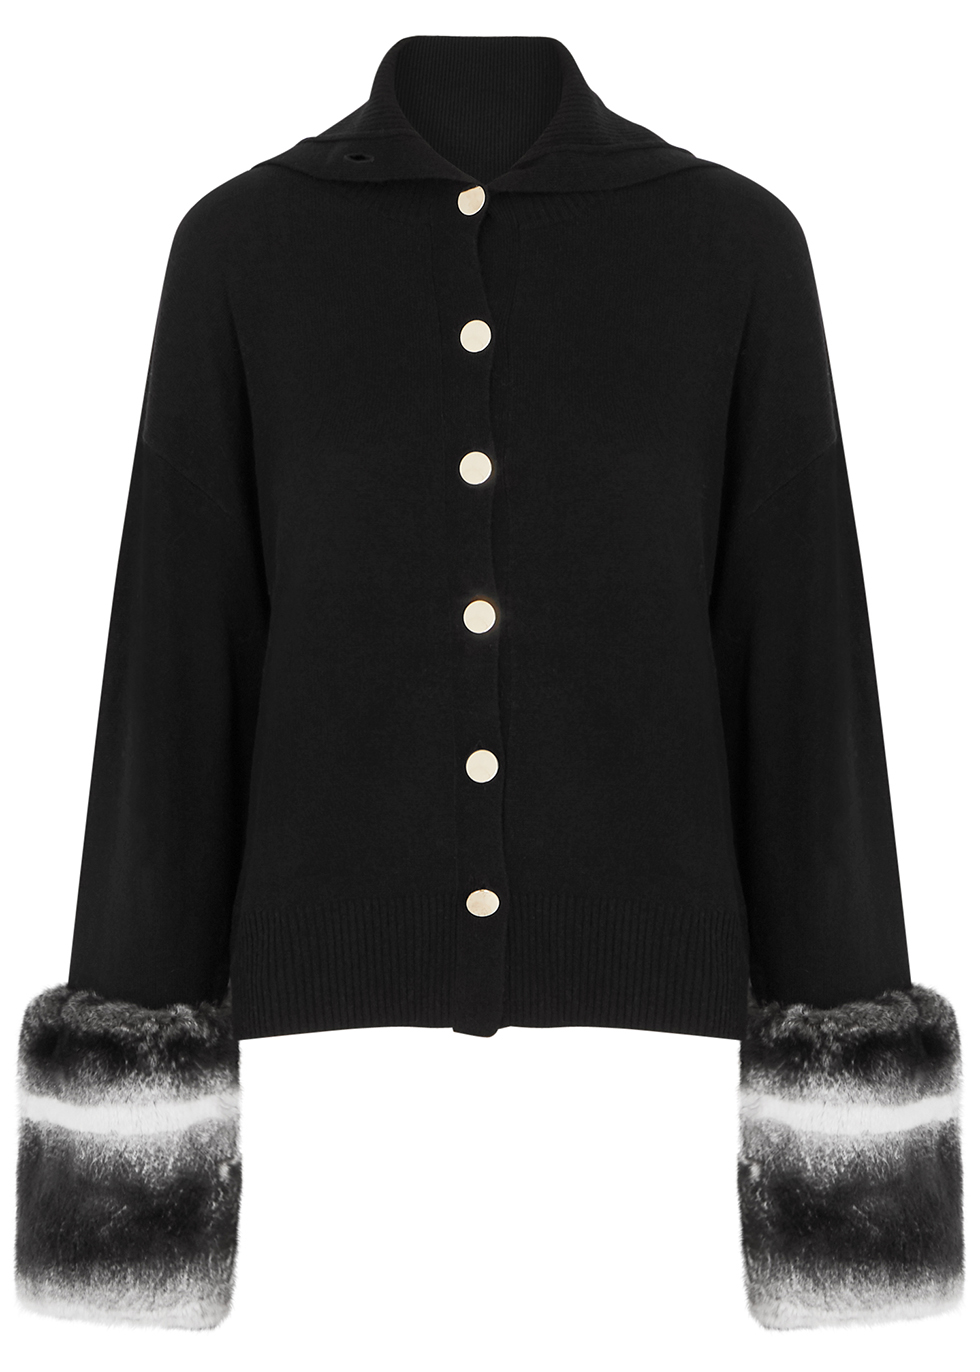 Black fur-trimmed wool-blend cardigan